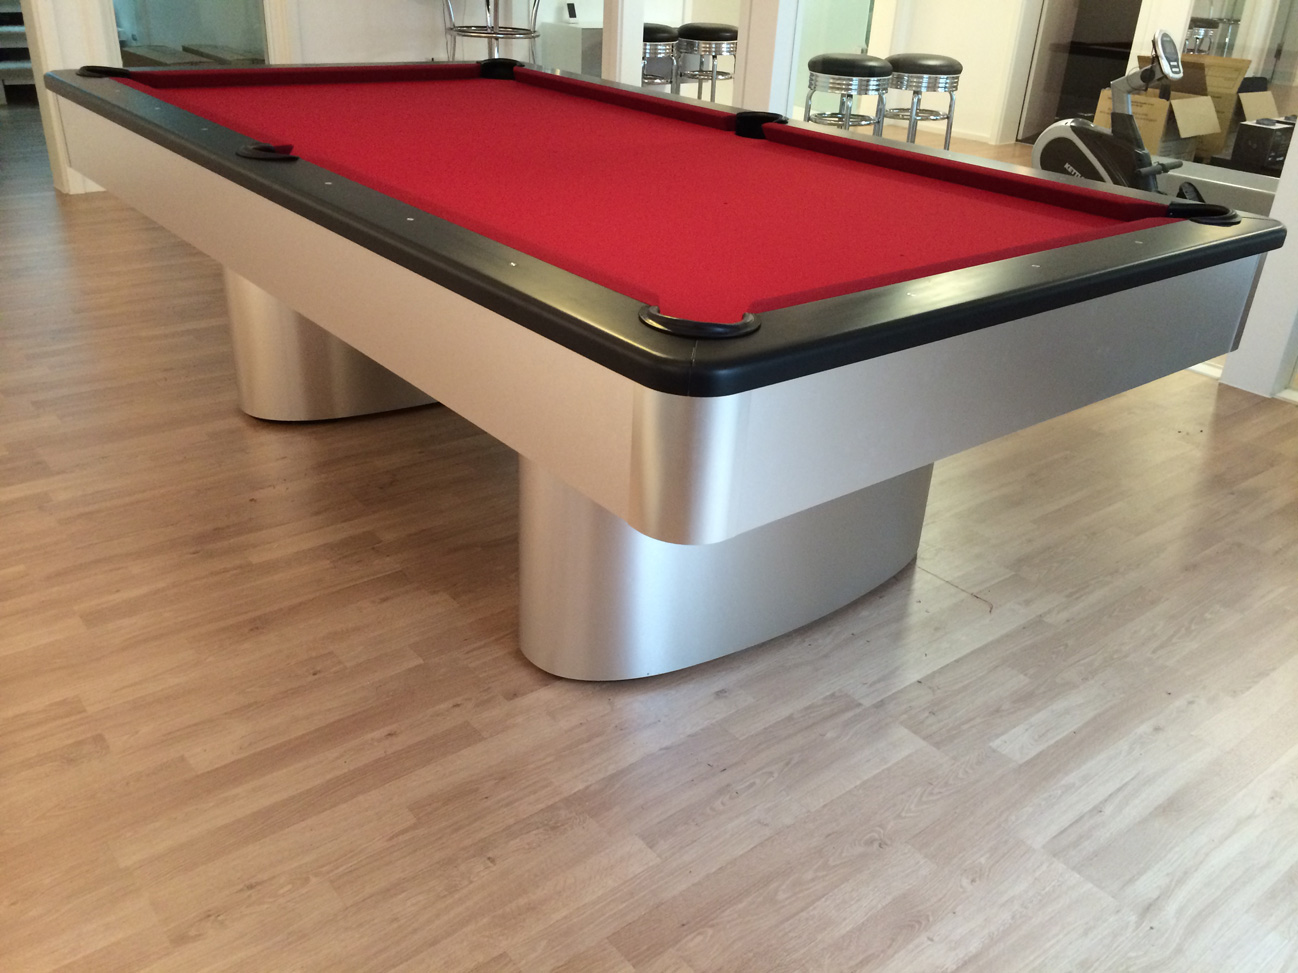 & Olhausen Sahara Pool Table in Brushed Aluminium (Red Cloth)